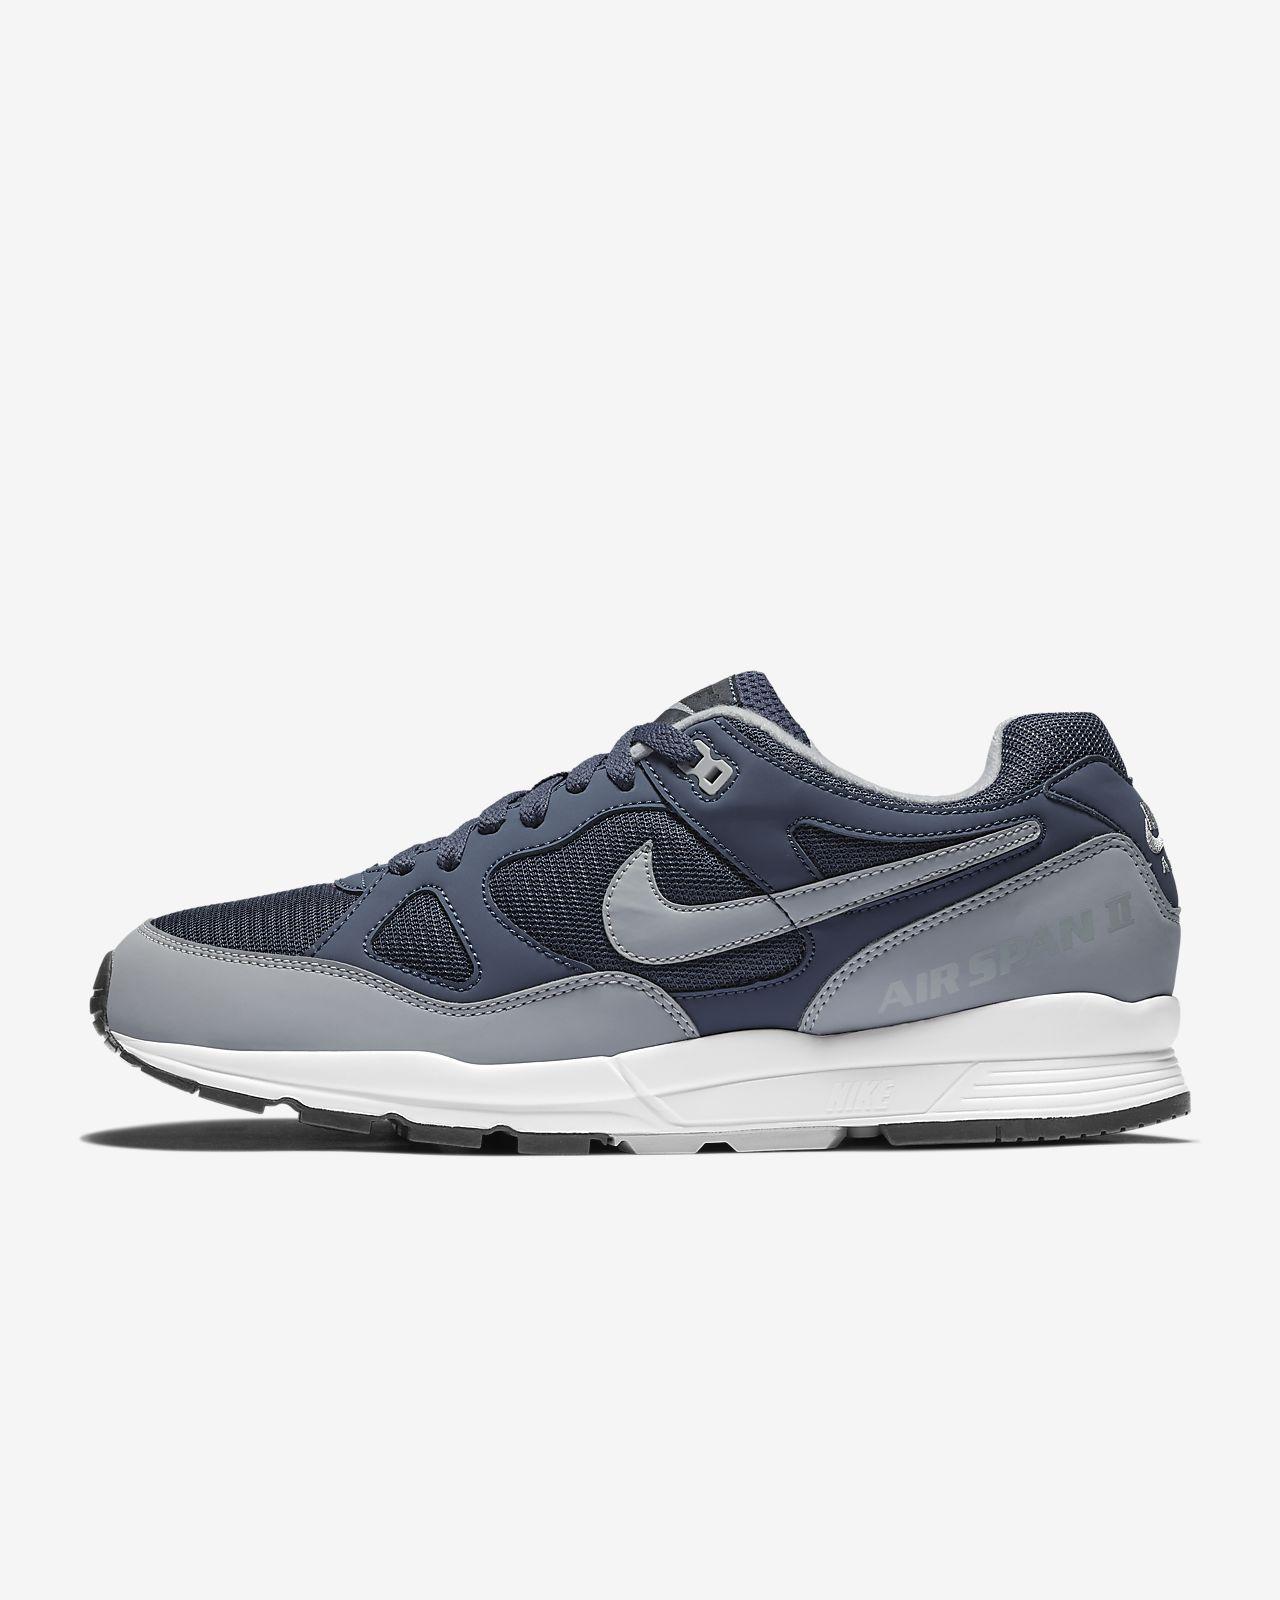 wholesale dealer 5bb01 452e1 Nike Span Chaussure Ii Air Ca Pour Homme 10wqFxwU.